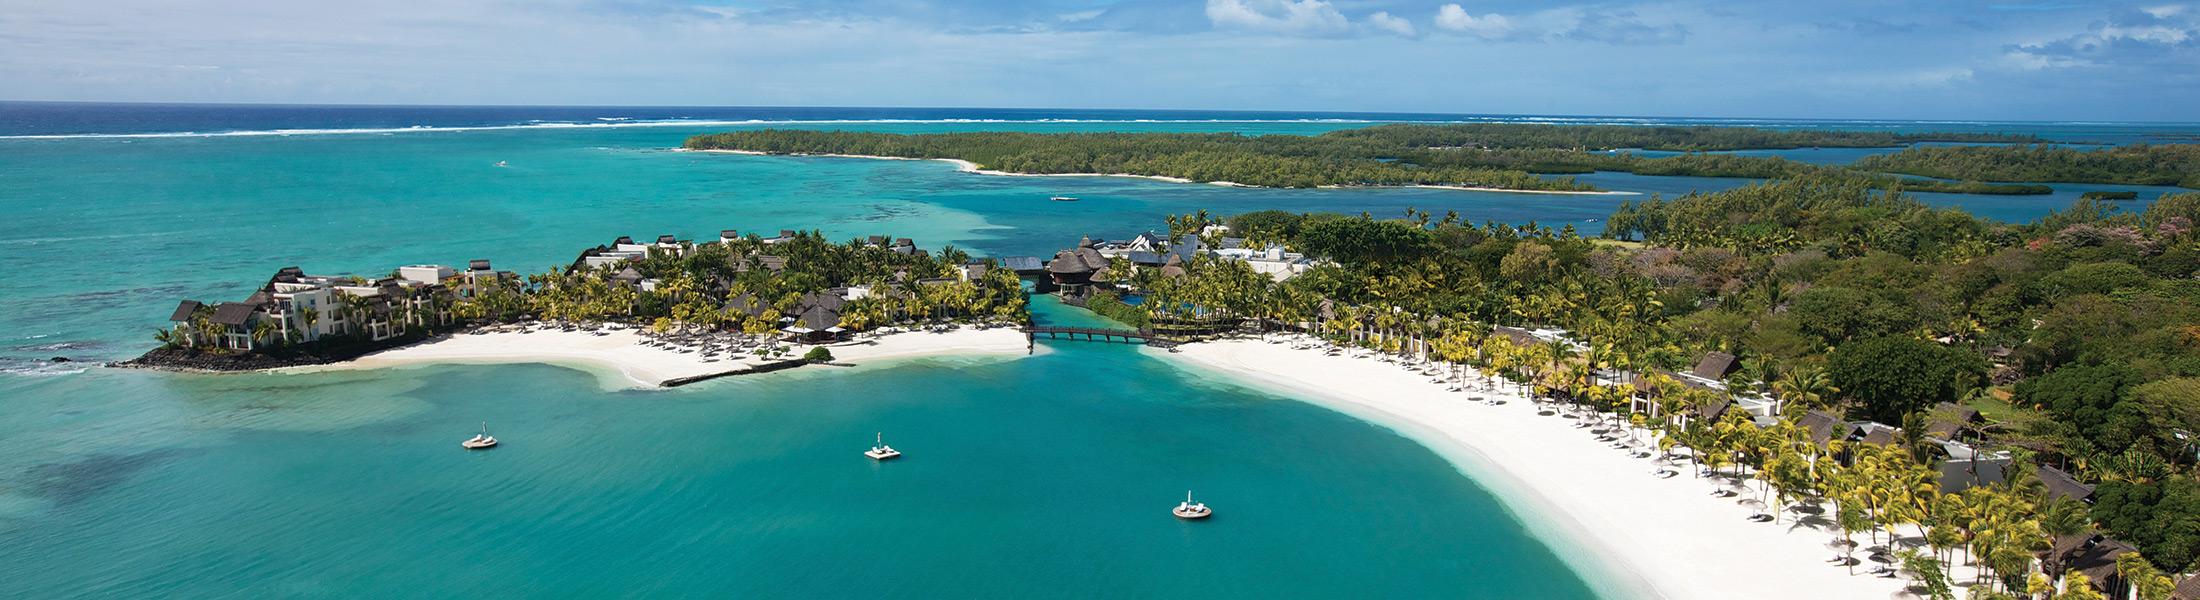 Aerial view of Shangri-La's Le Touessrok Mauritius